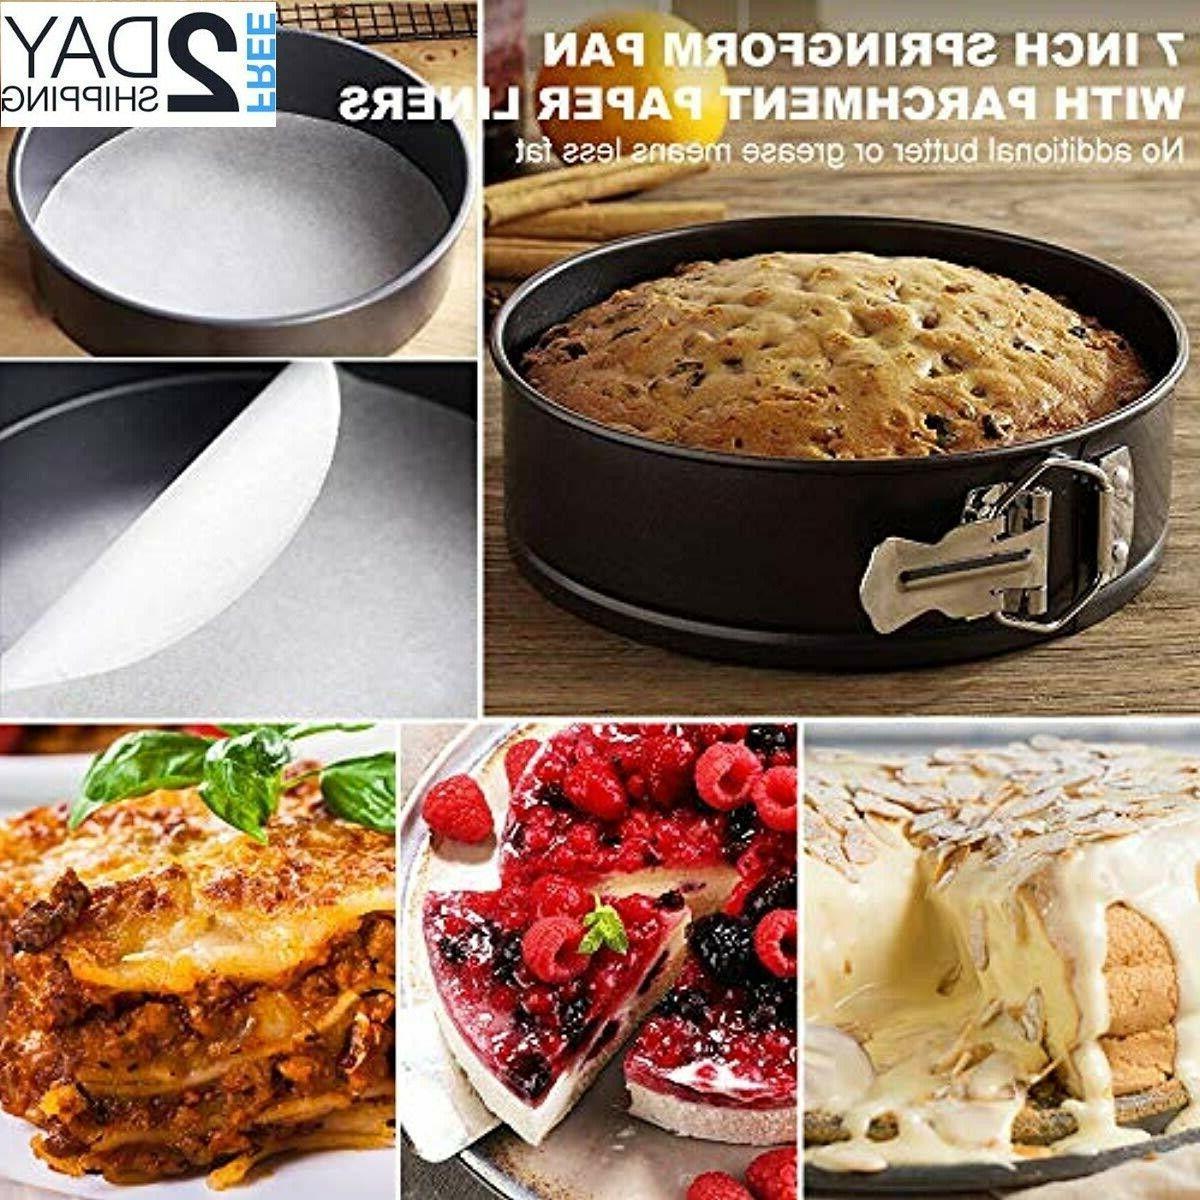 22 Pcs Pressure Cooker Accessories Set Compatible with Instant Pot 5,6,8 2